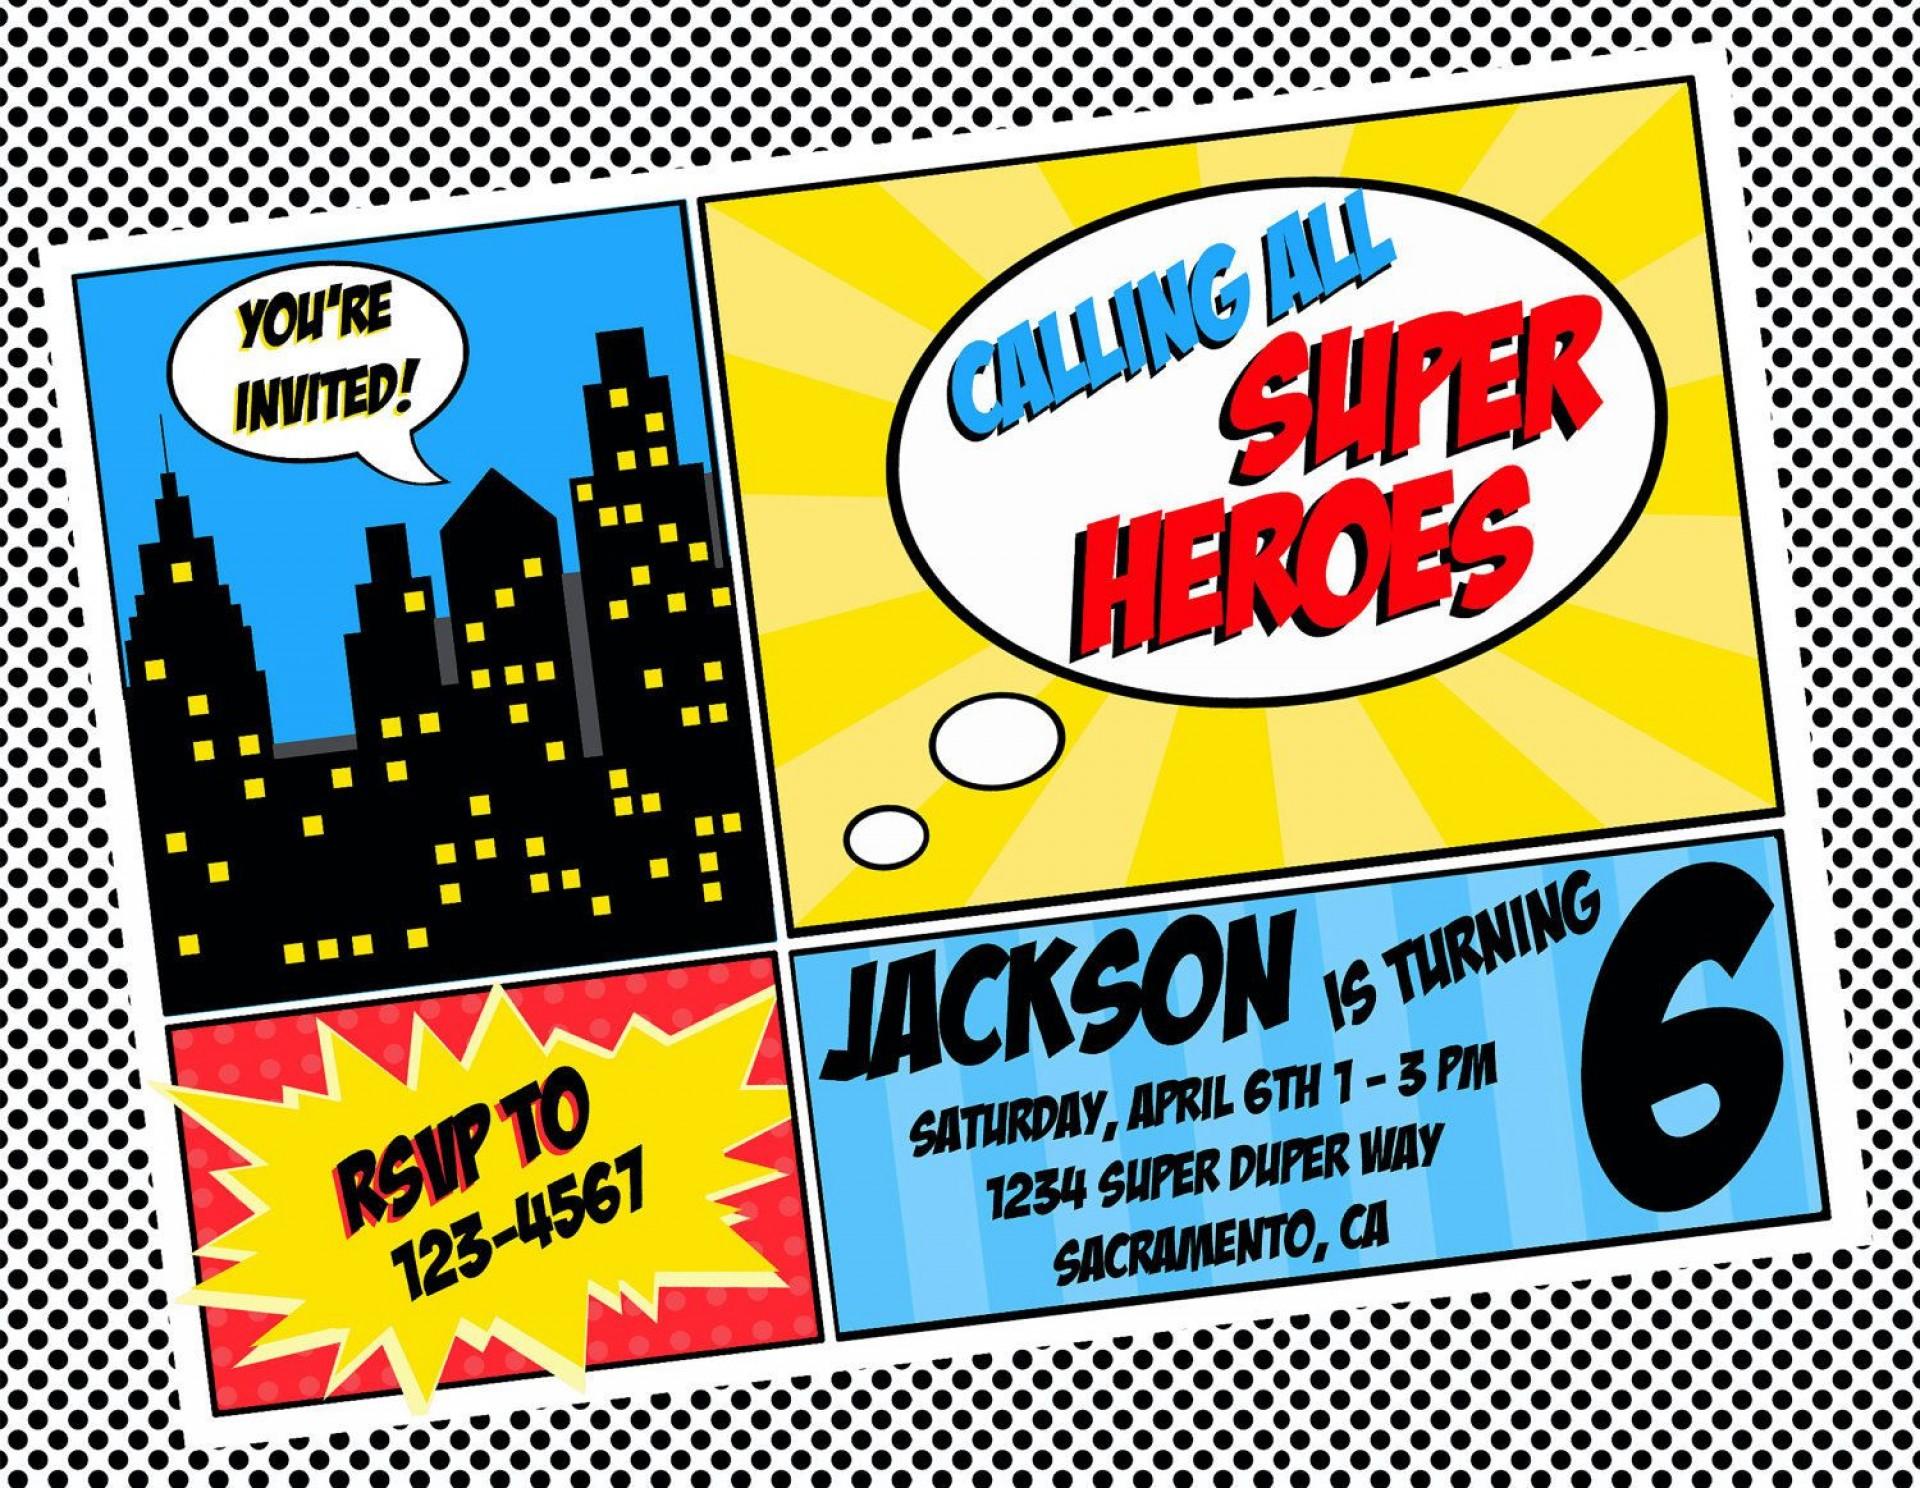 008 Sensational Superhero Birthday Invitation Template Free High Definition 1920